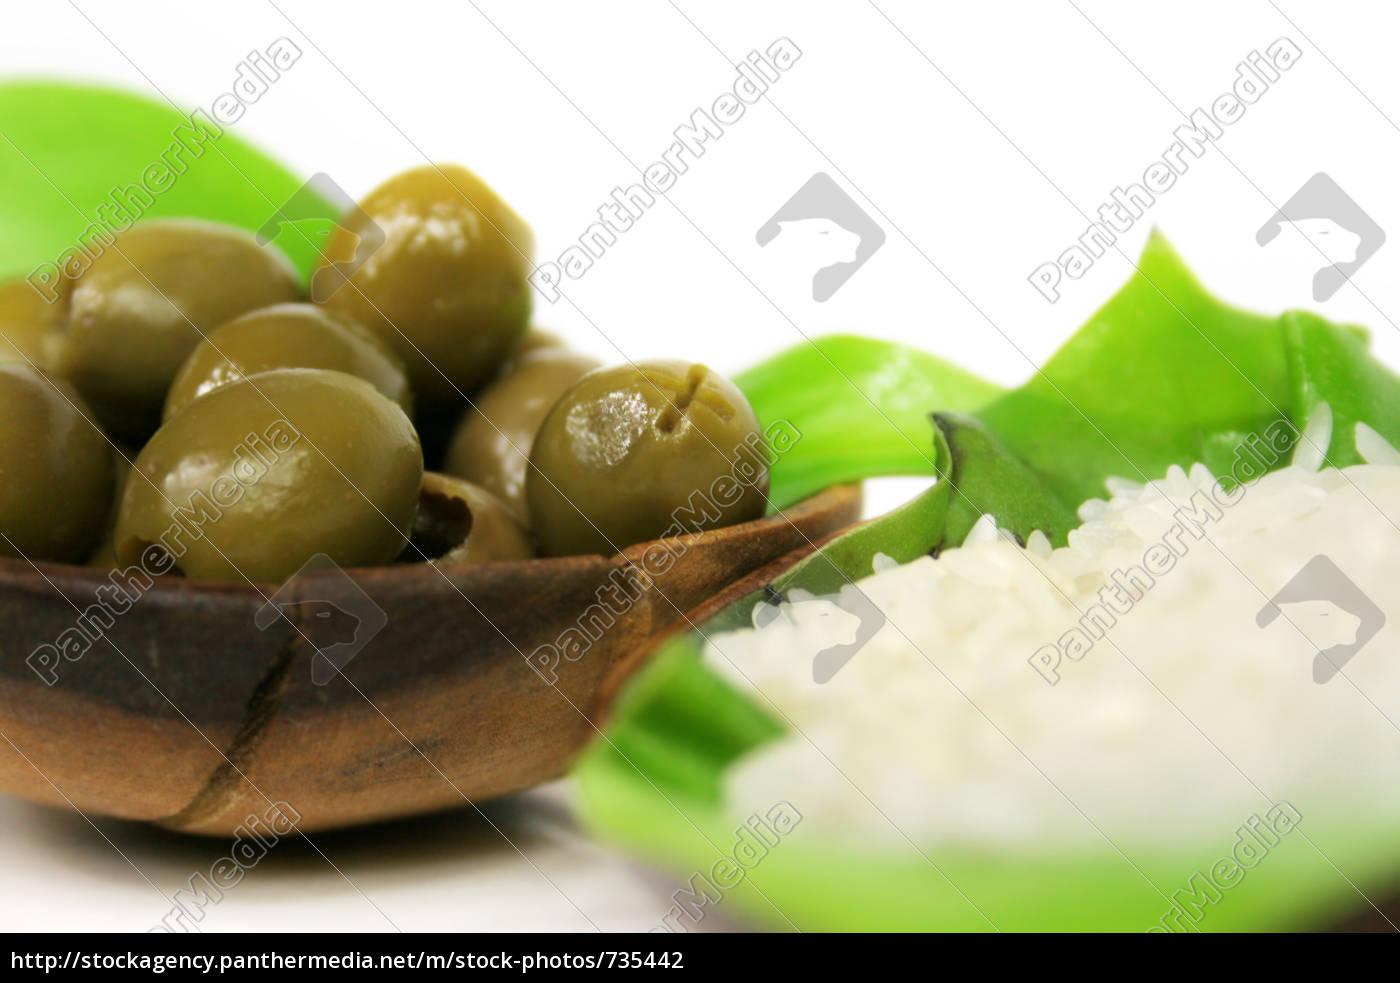 olive - 735442